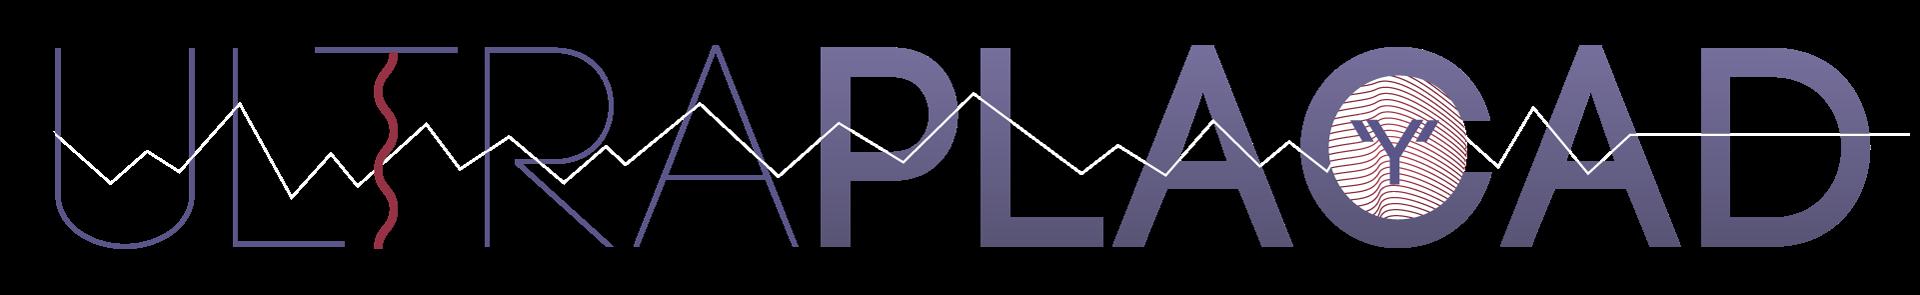 UltraPlacad_logo